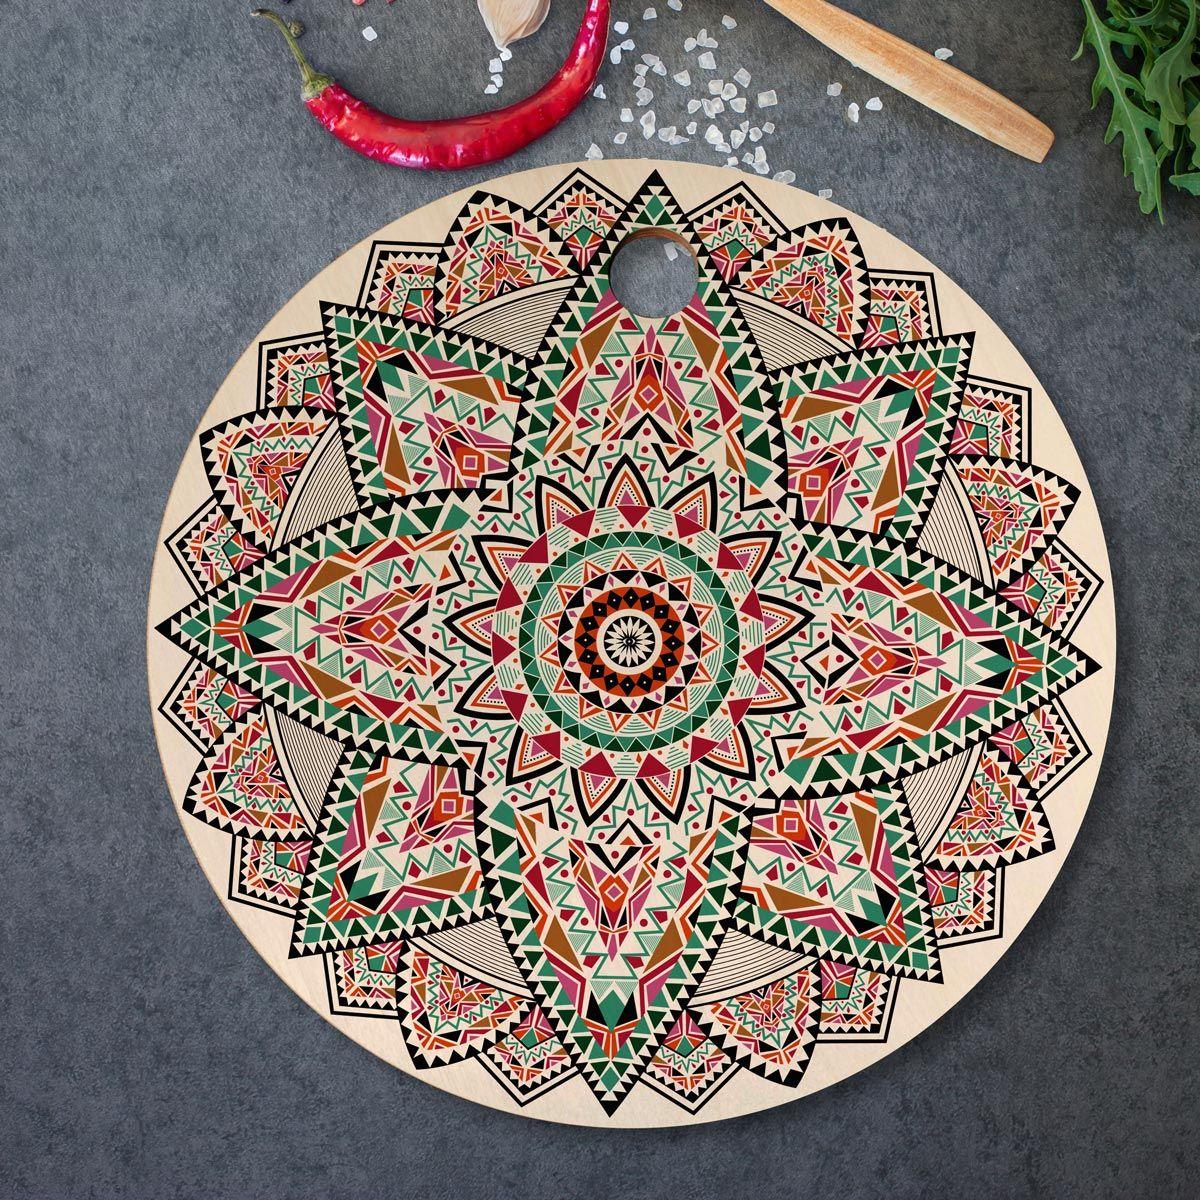 15f3fcf6bc3 Mandala Snijplank voor alle Mandala liefhebbers! | snelle levering